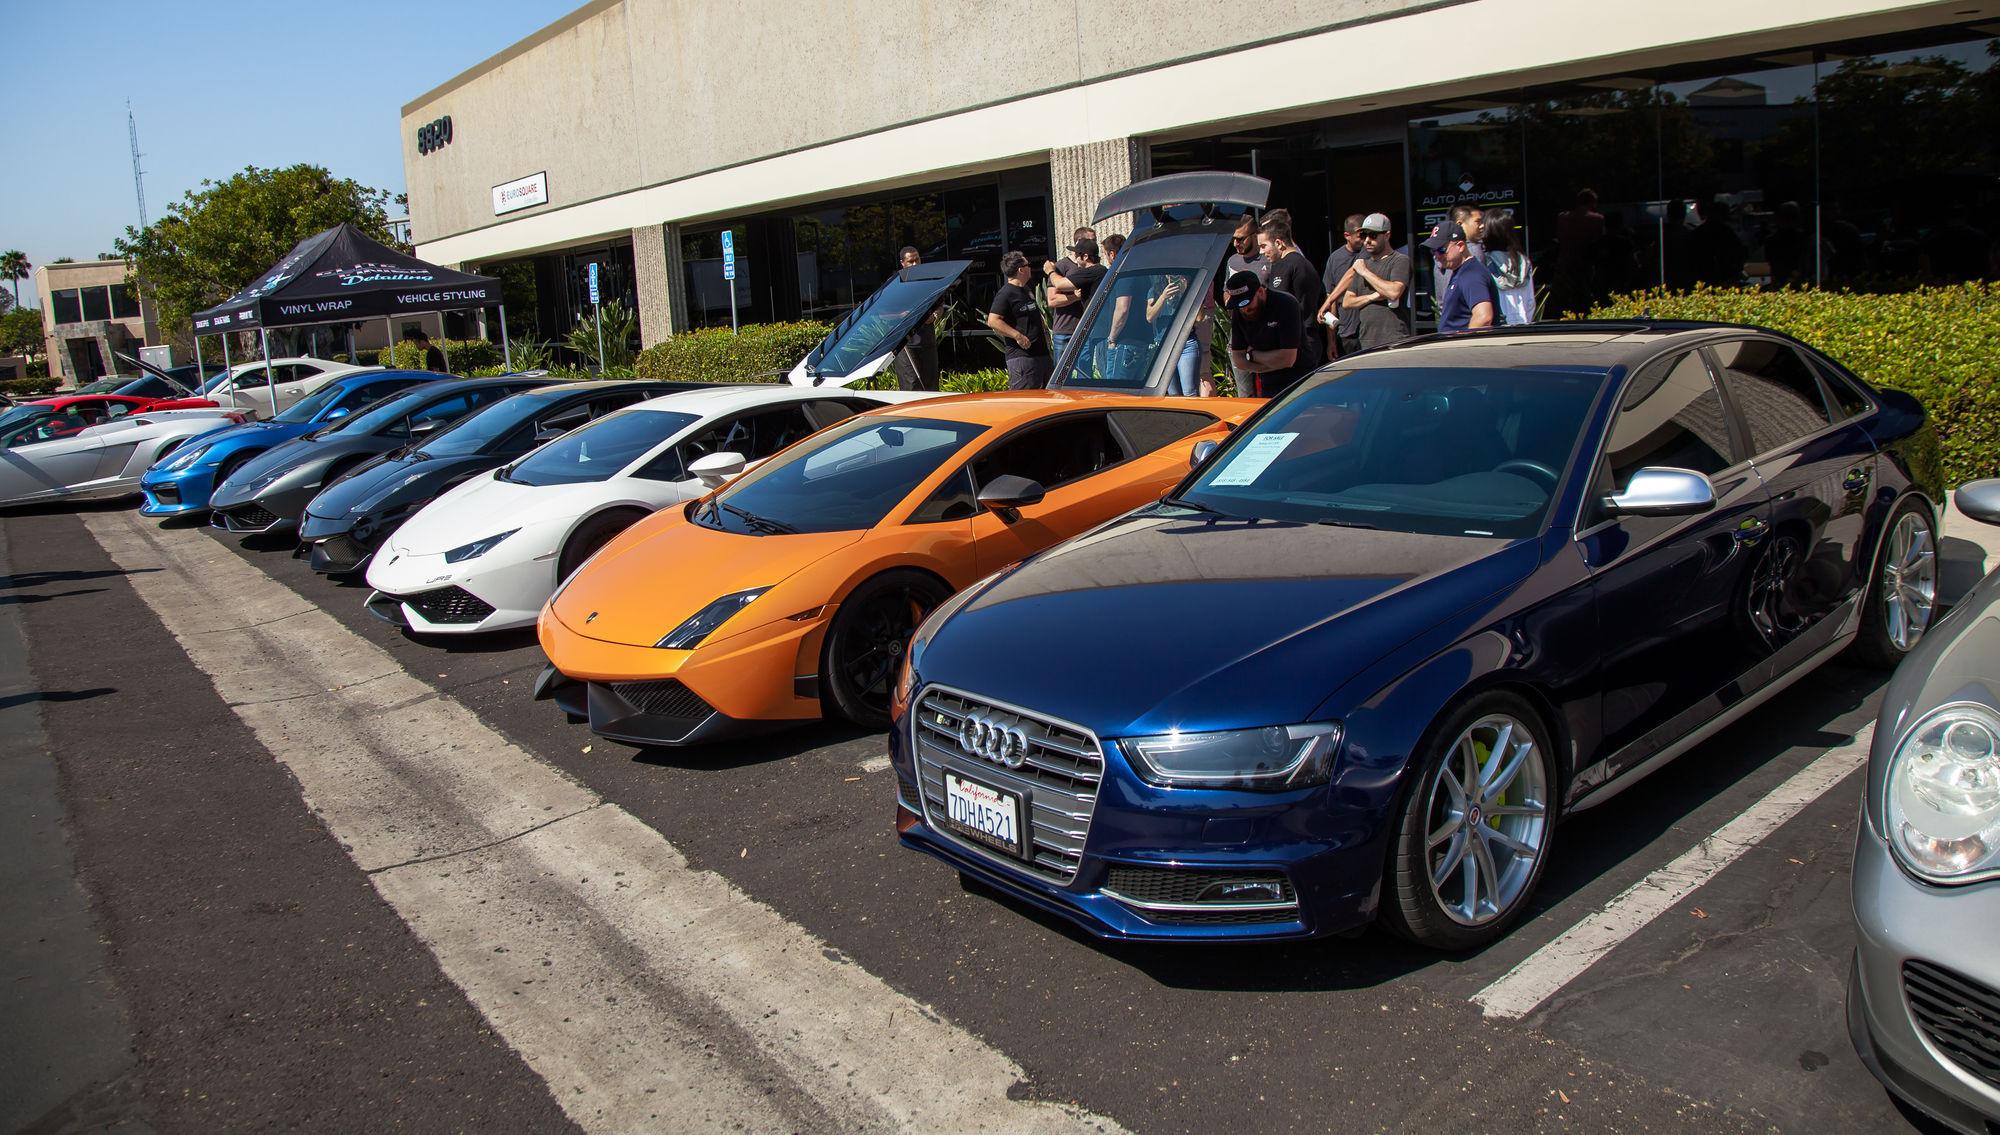 Lamborghini  | San Diego Cars & Coffee July 16th, 2016